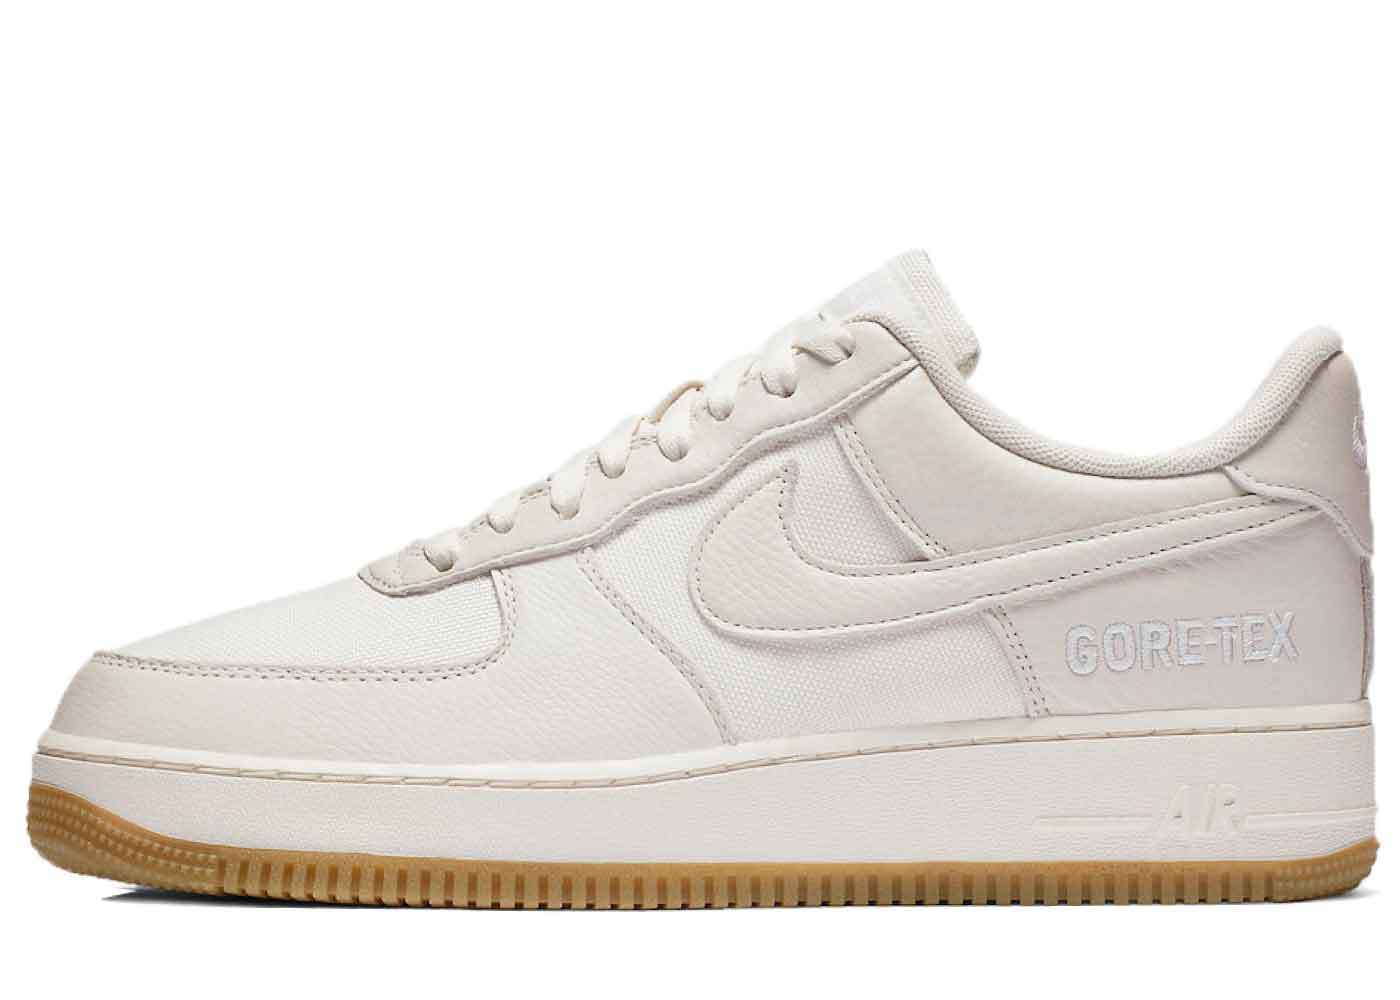 Nike Air Force 1 Low Gore-Tex Sail Gumの写真